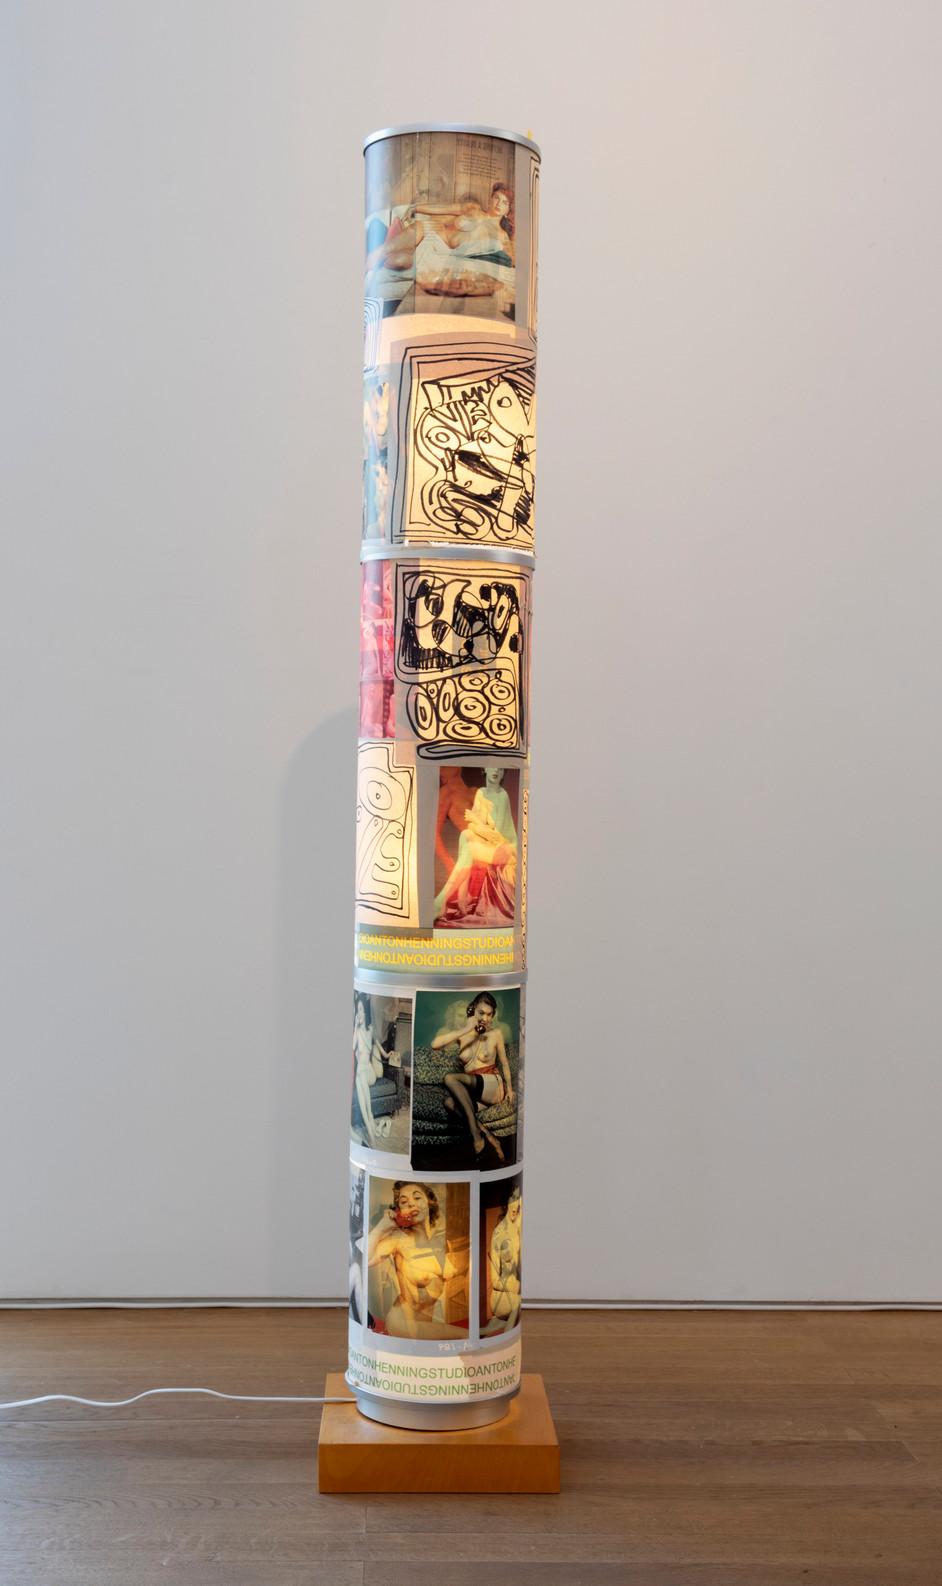 ANTON HENNING Stehlampe No. 13, 2019 metal, plastic, printed paper, marker on paper 138 x ø19 cm